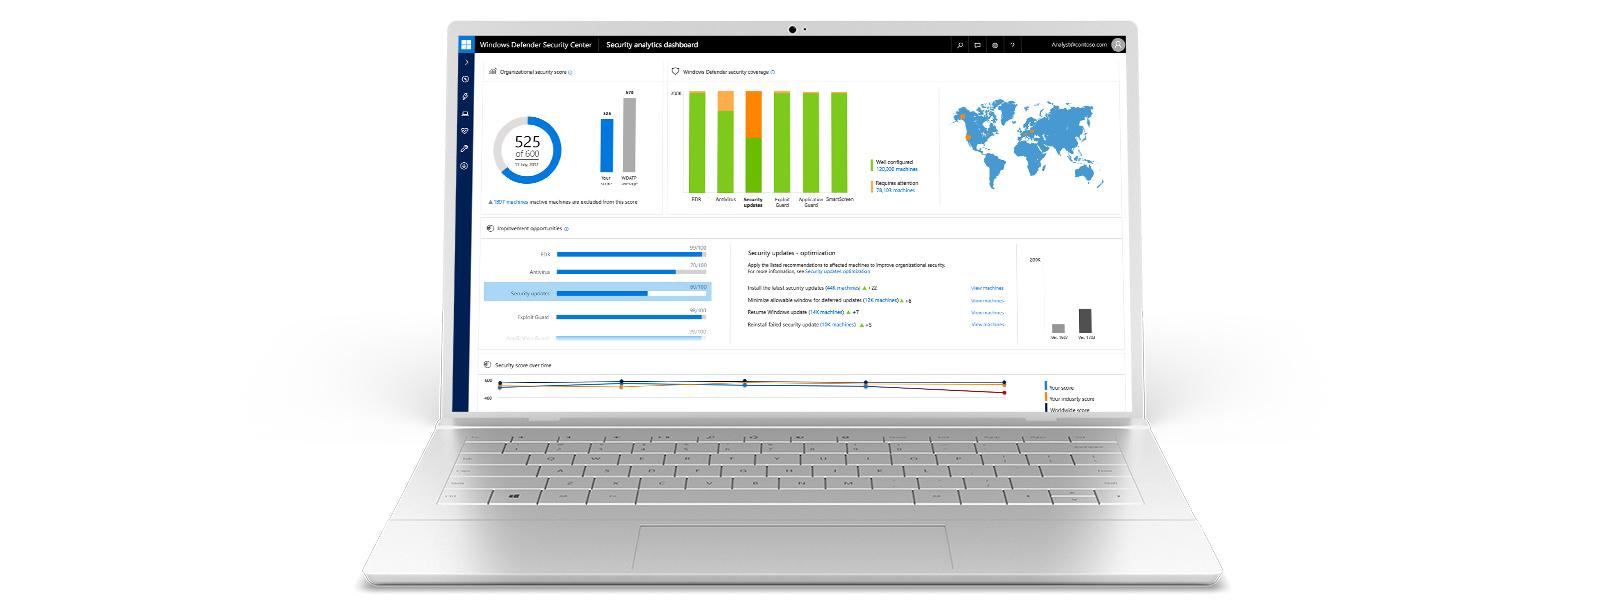 Windows 10 op een Surface Book